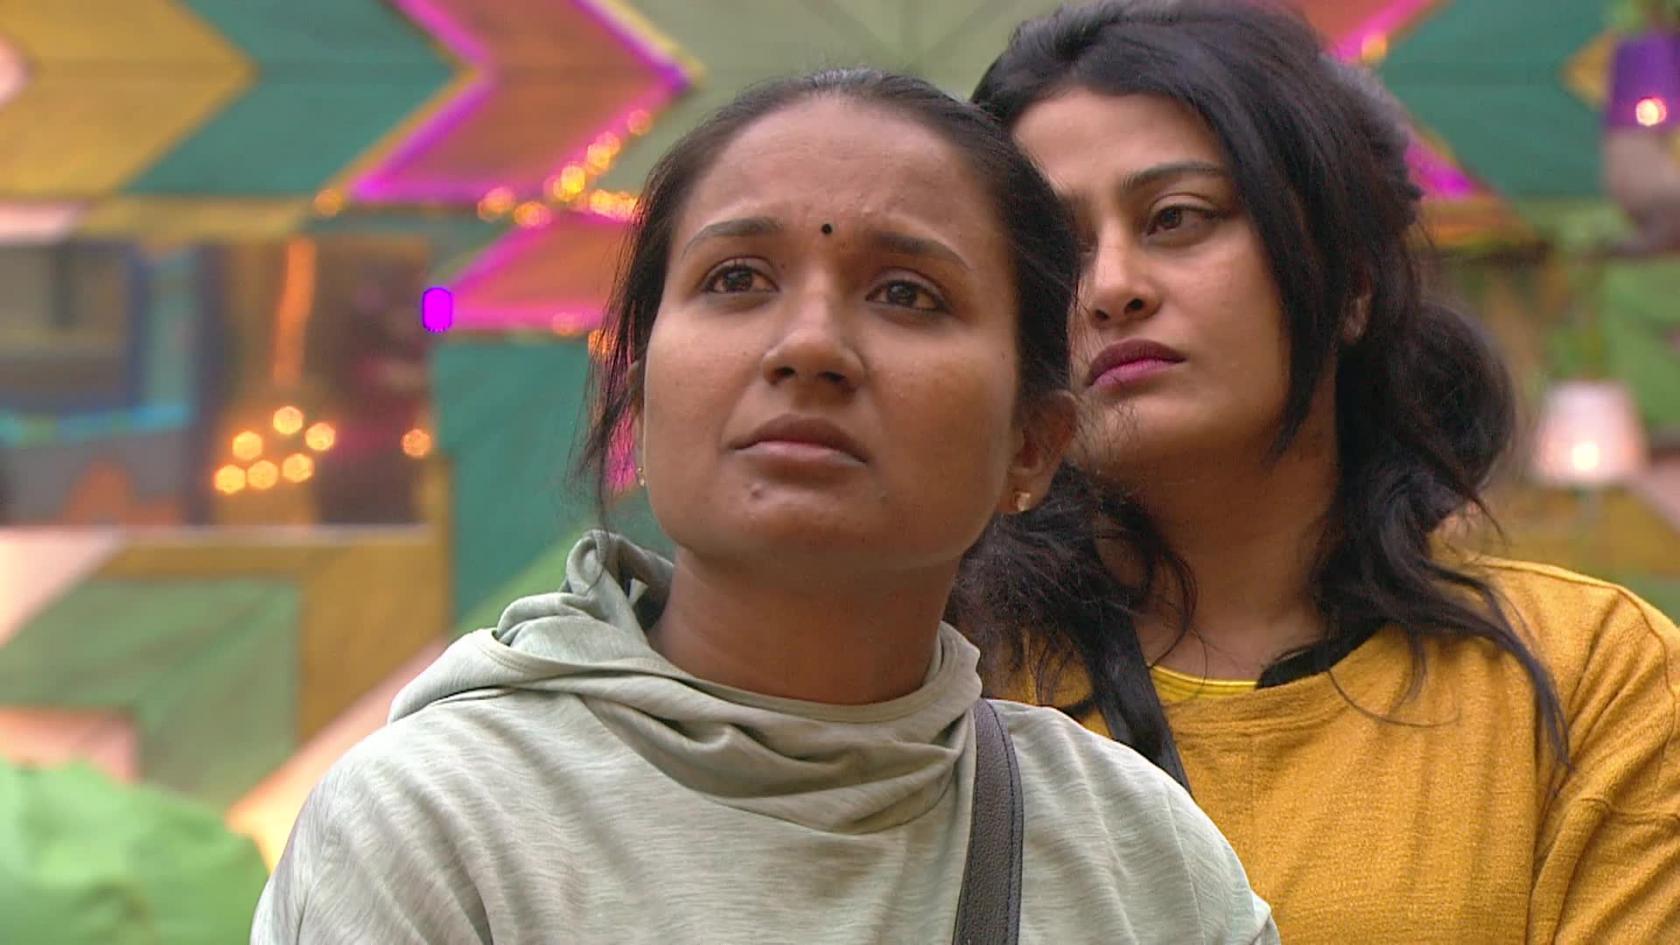 Watch Bigg Boss Kannada Season 8 Full Episode 2 - 01 Mar 2021 Online for  Free on JioCinema.com